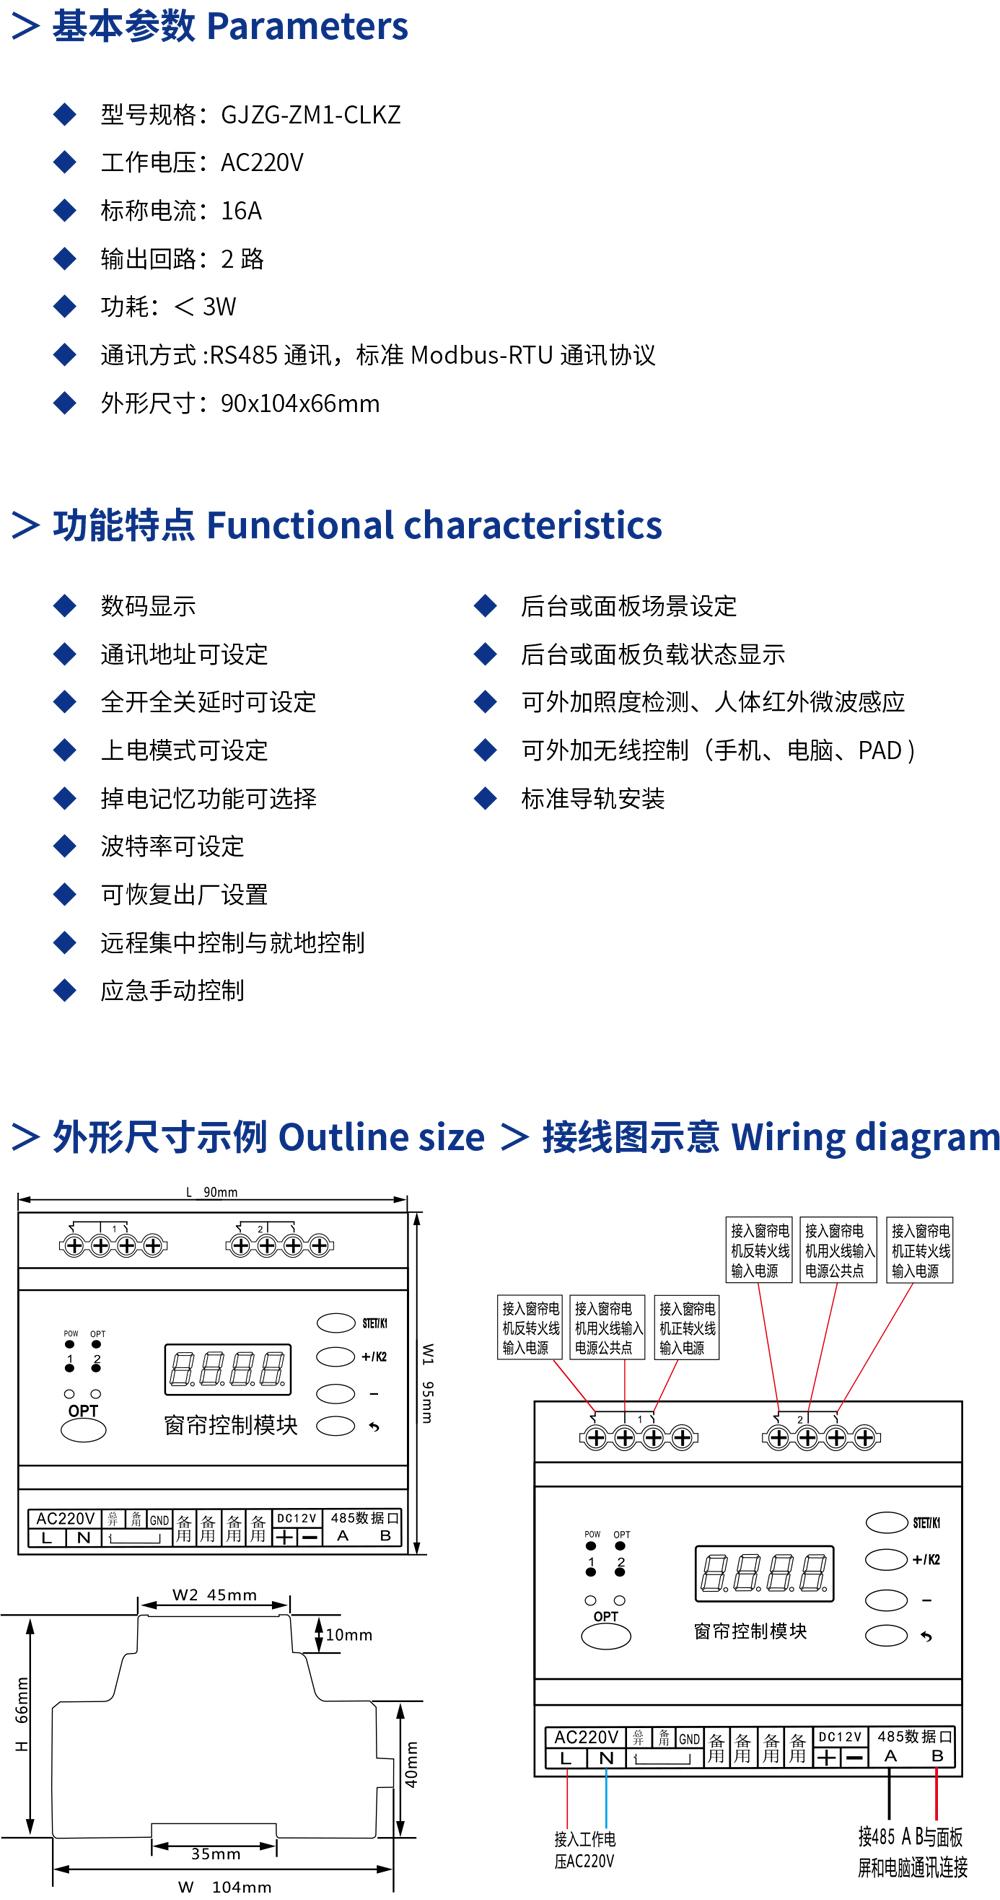 GJZG-ZM1-CLKZ-窗簾控制模塊詳情.jpg